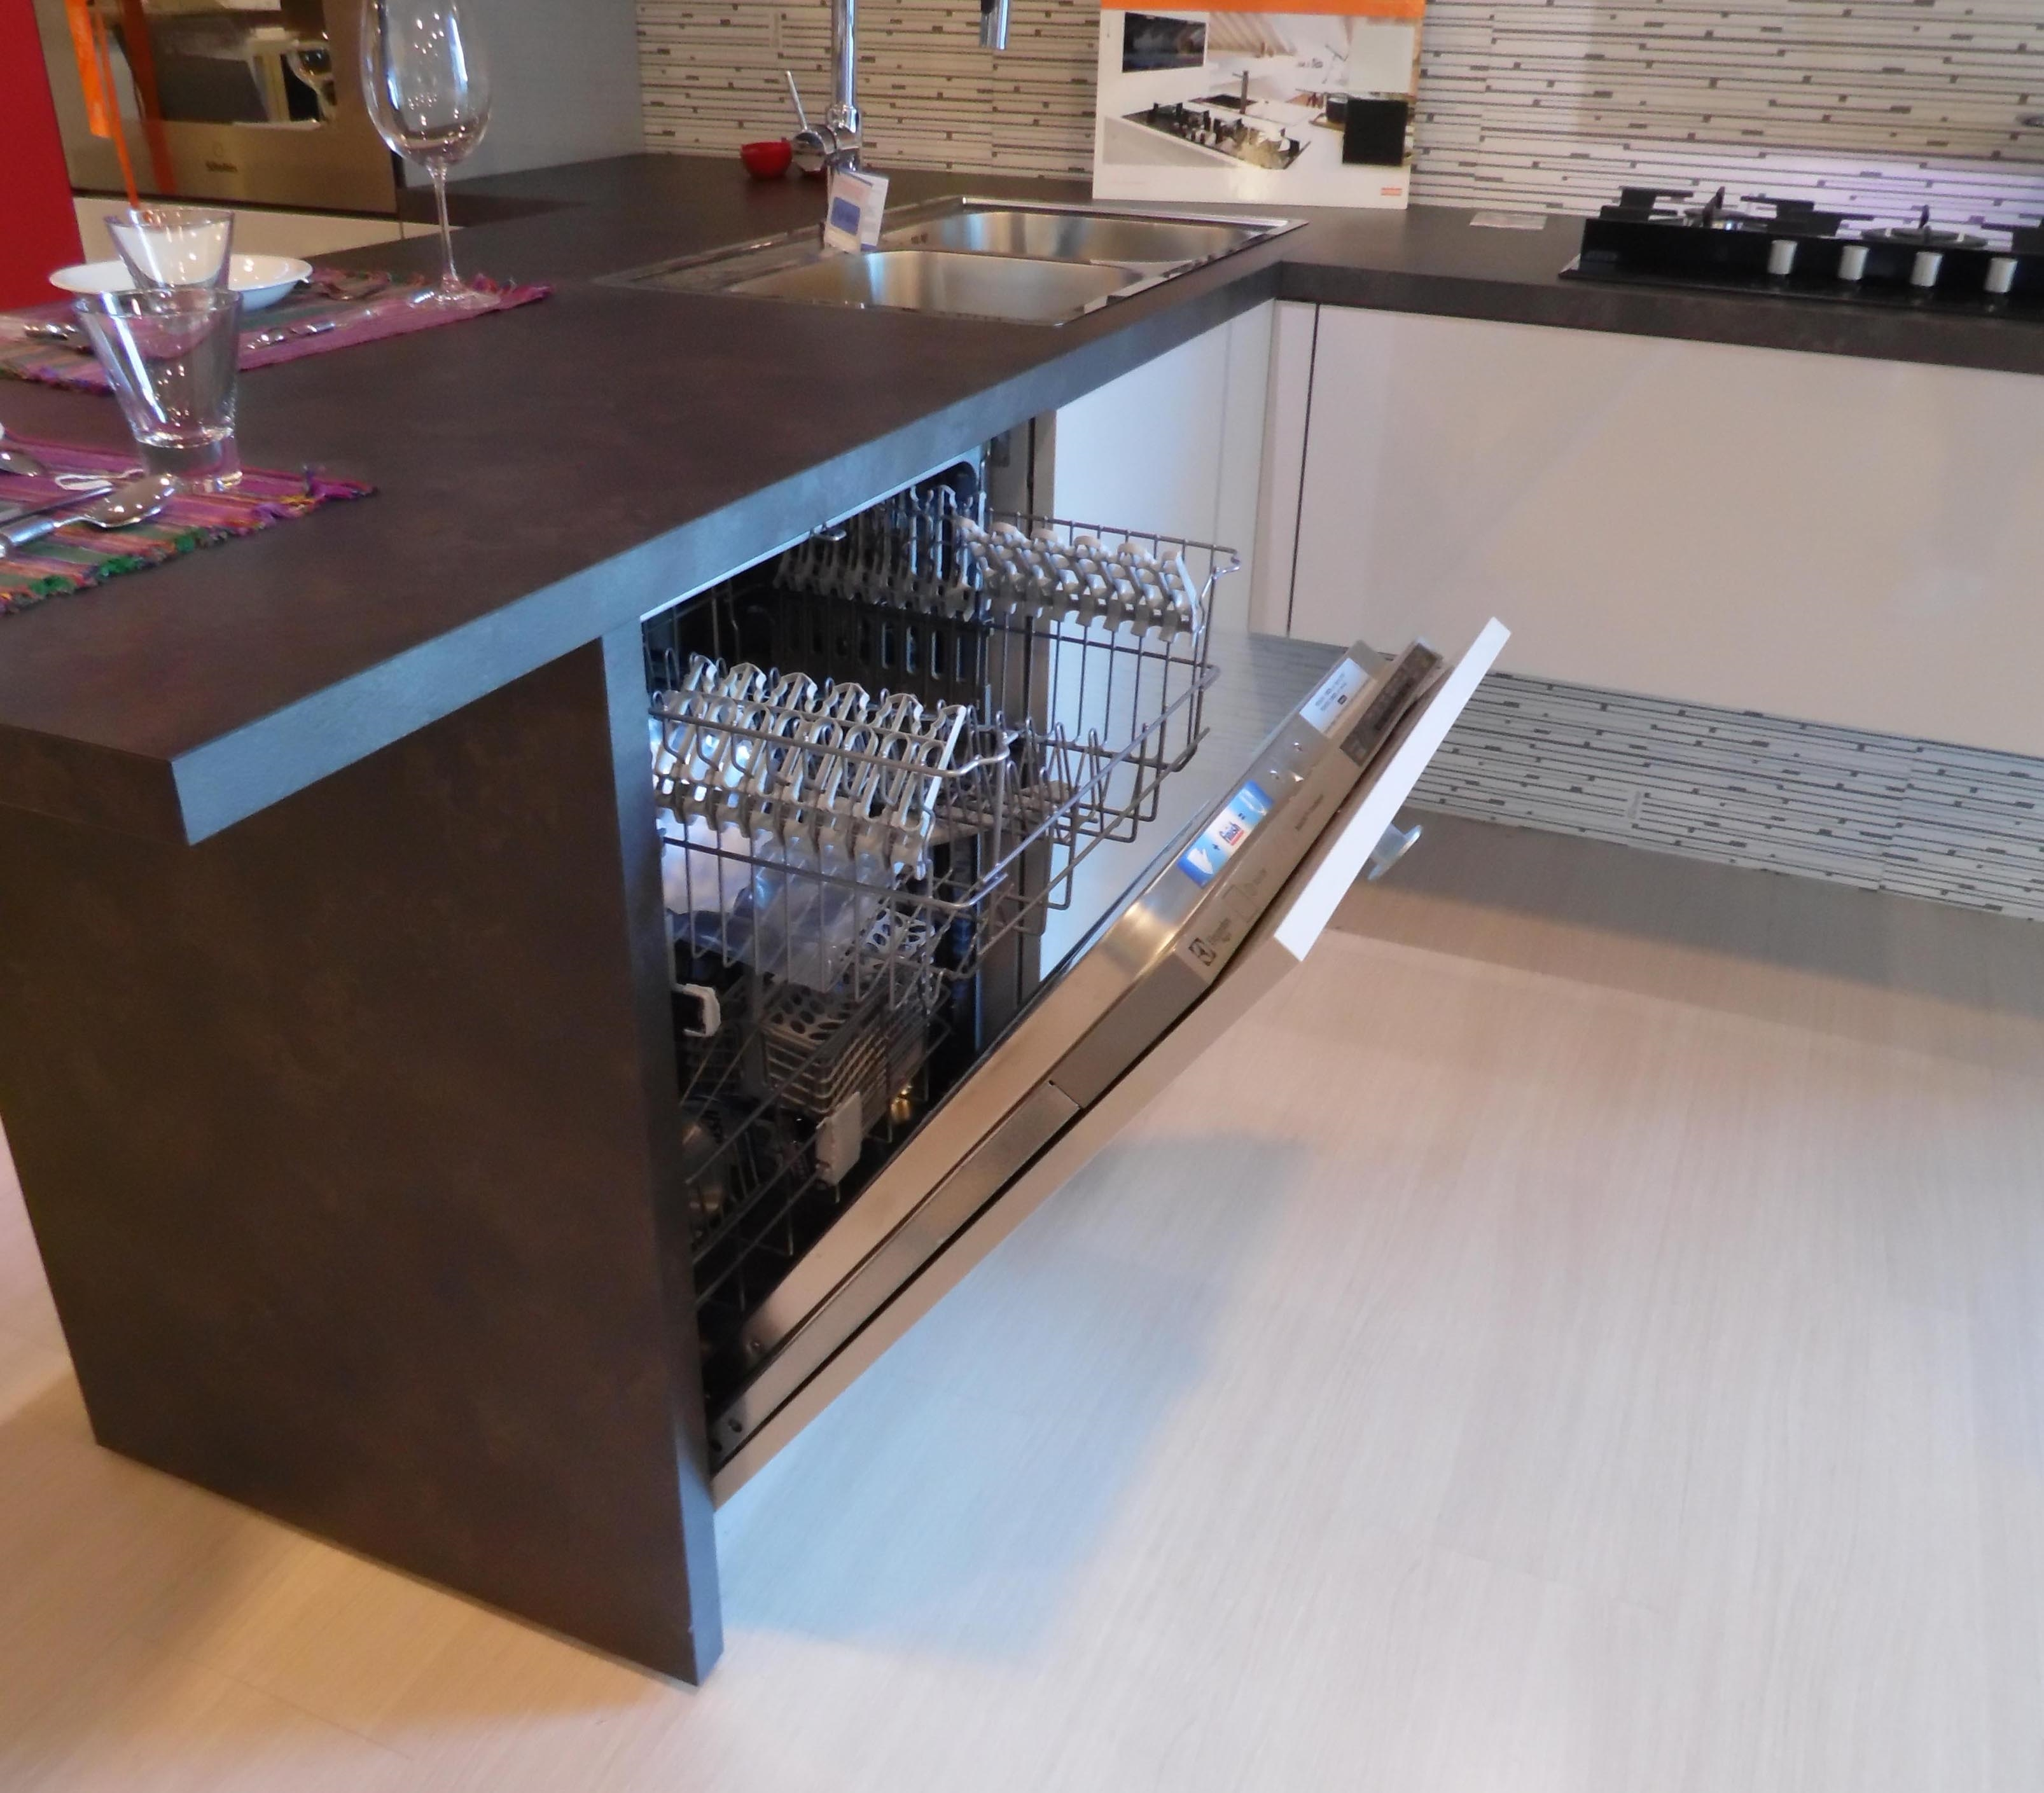 Attraente Opinioni Su Cucine Del Tongo Cucina Design Idee